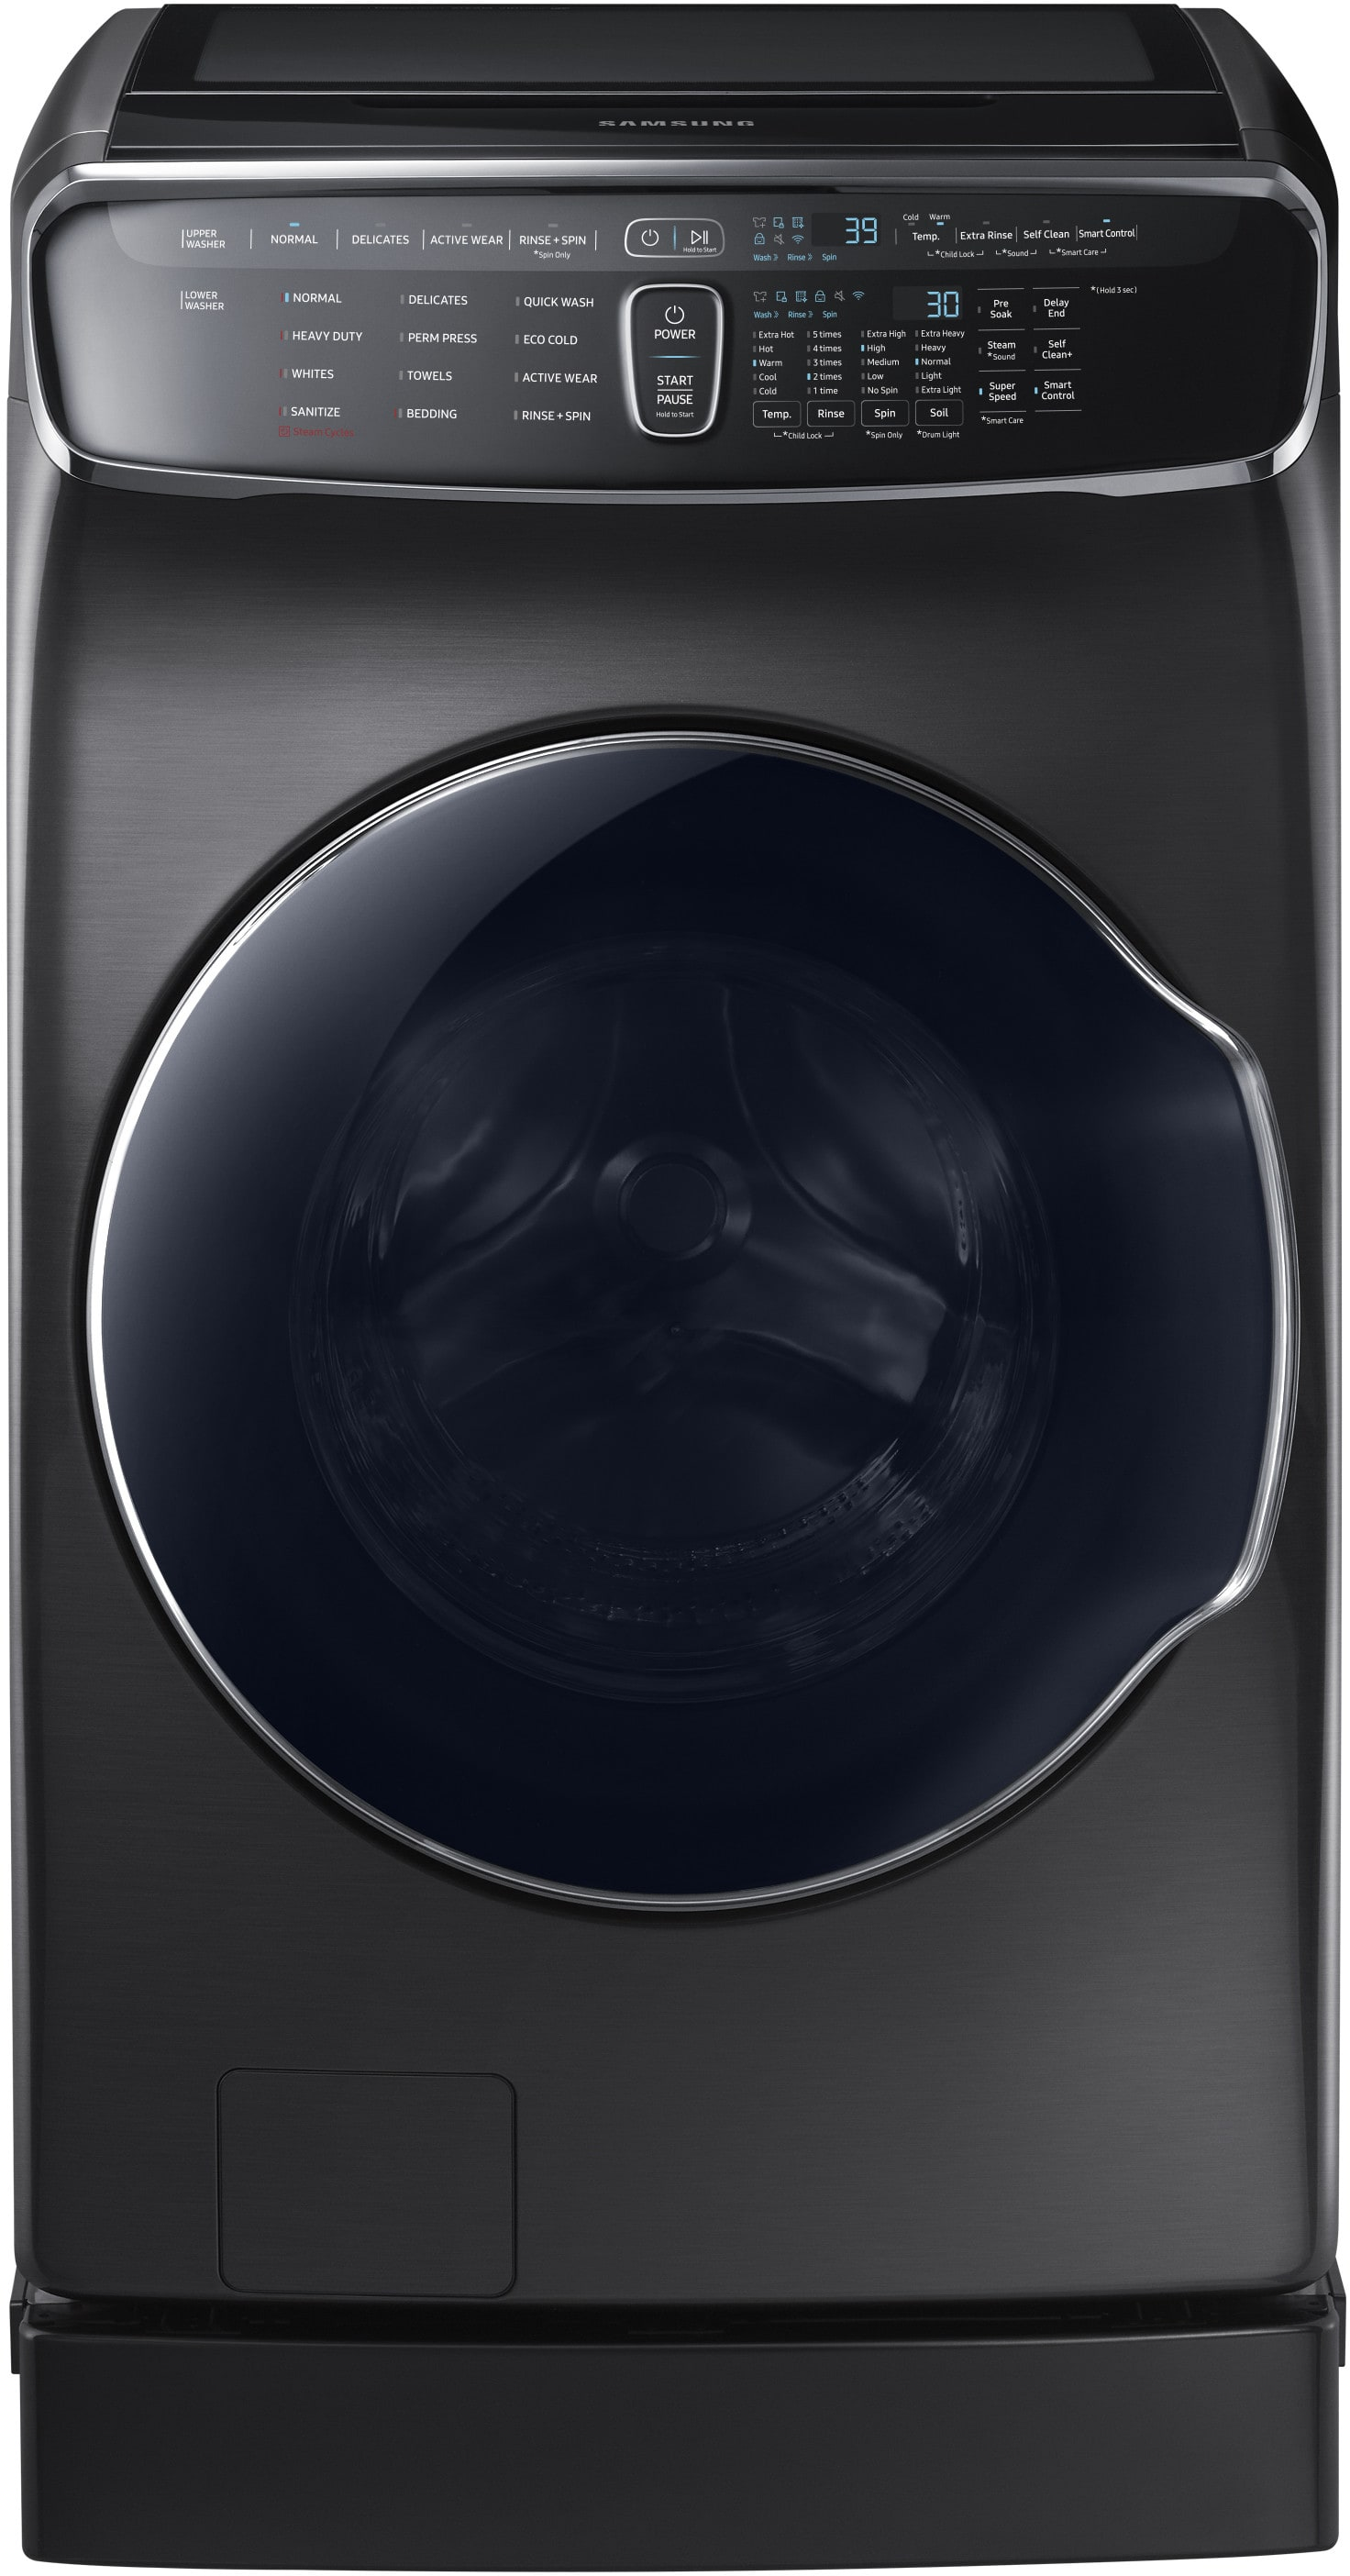 Samsung Wv60m9900av 27 Inch Flexwash Smart Washer With